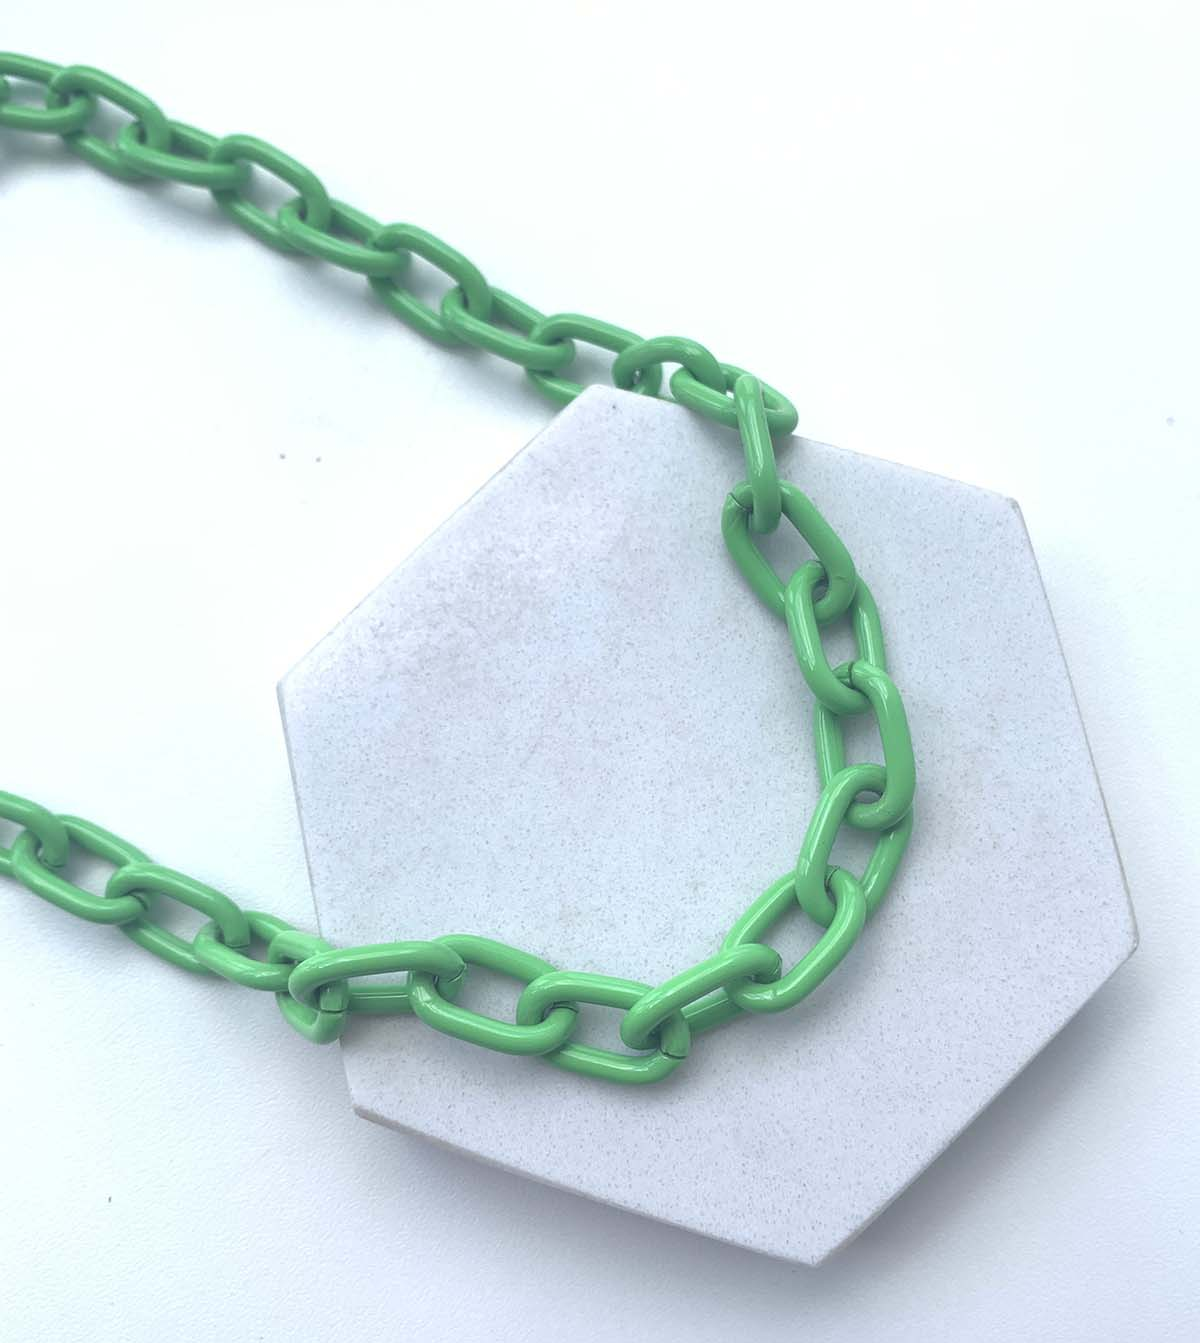 Colar Corrente Elos Verde Neon Resina